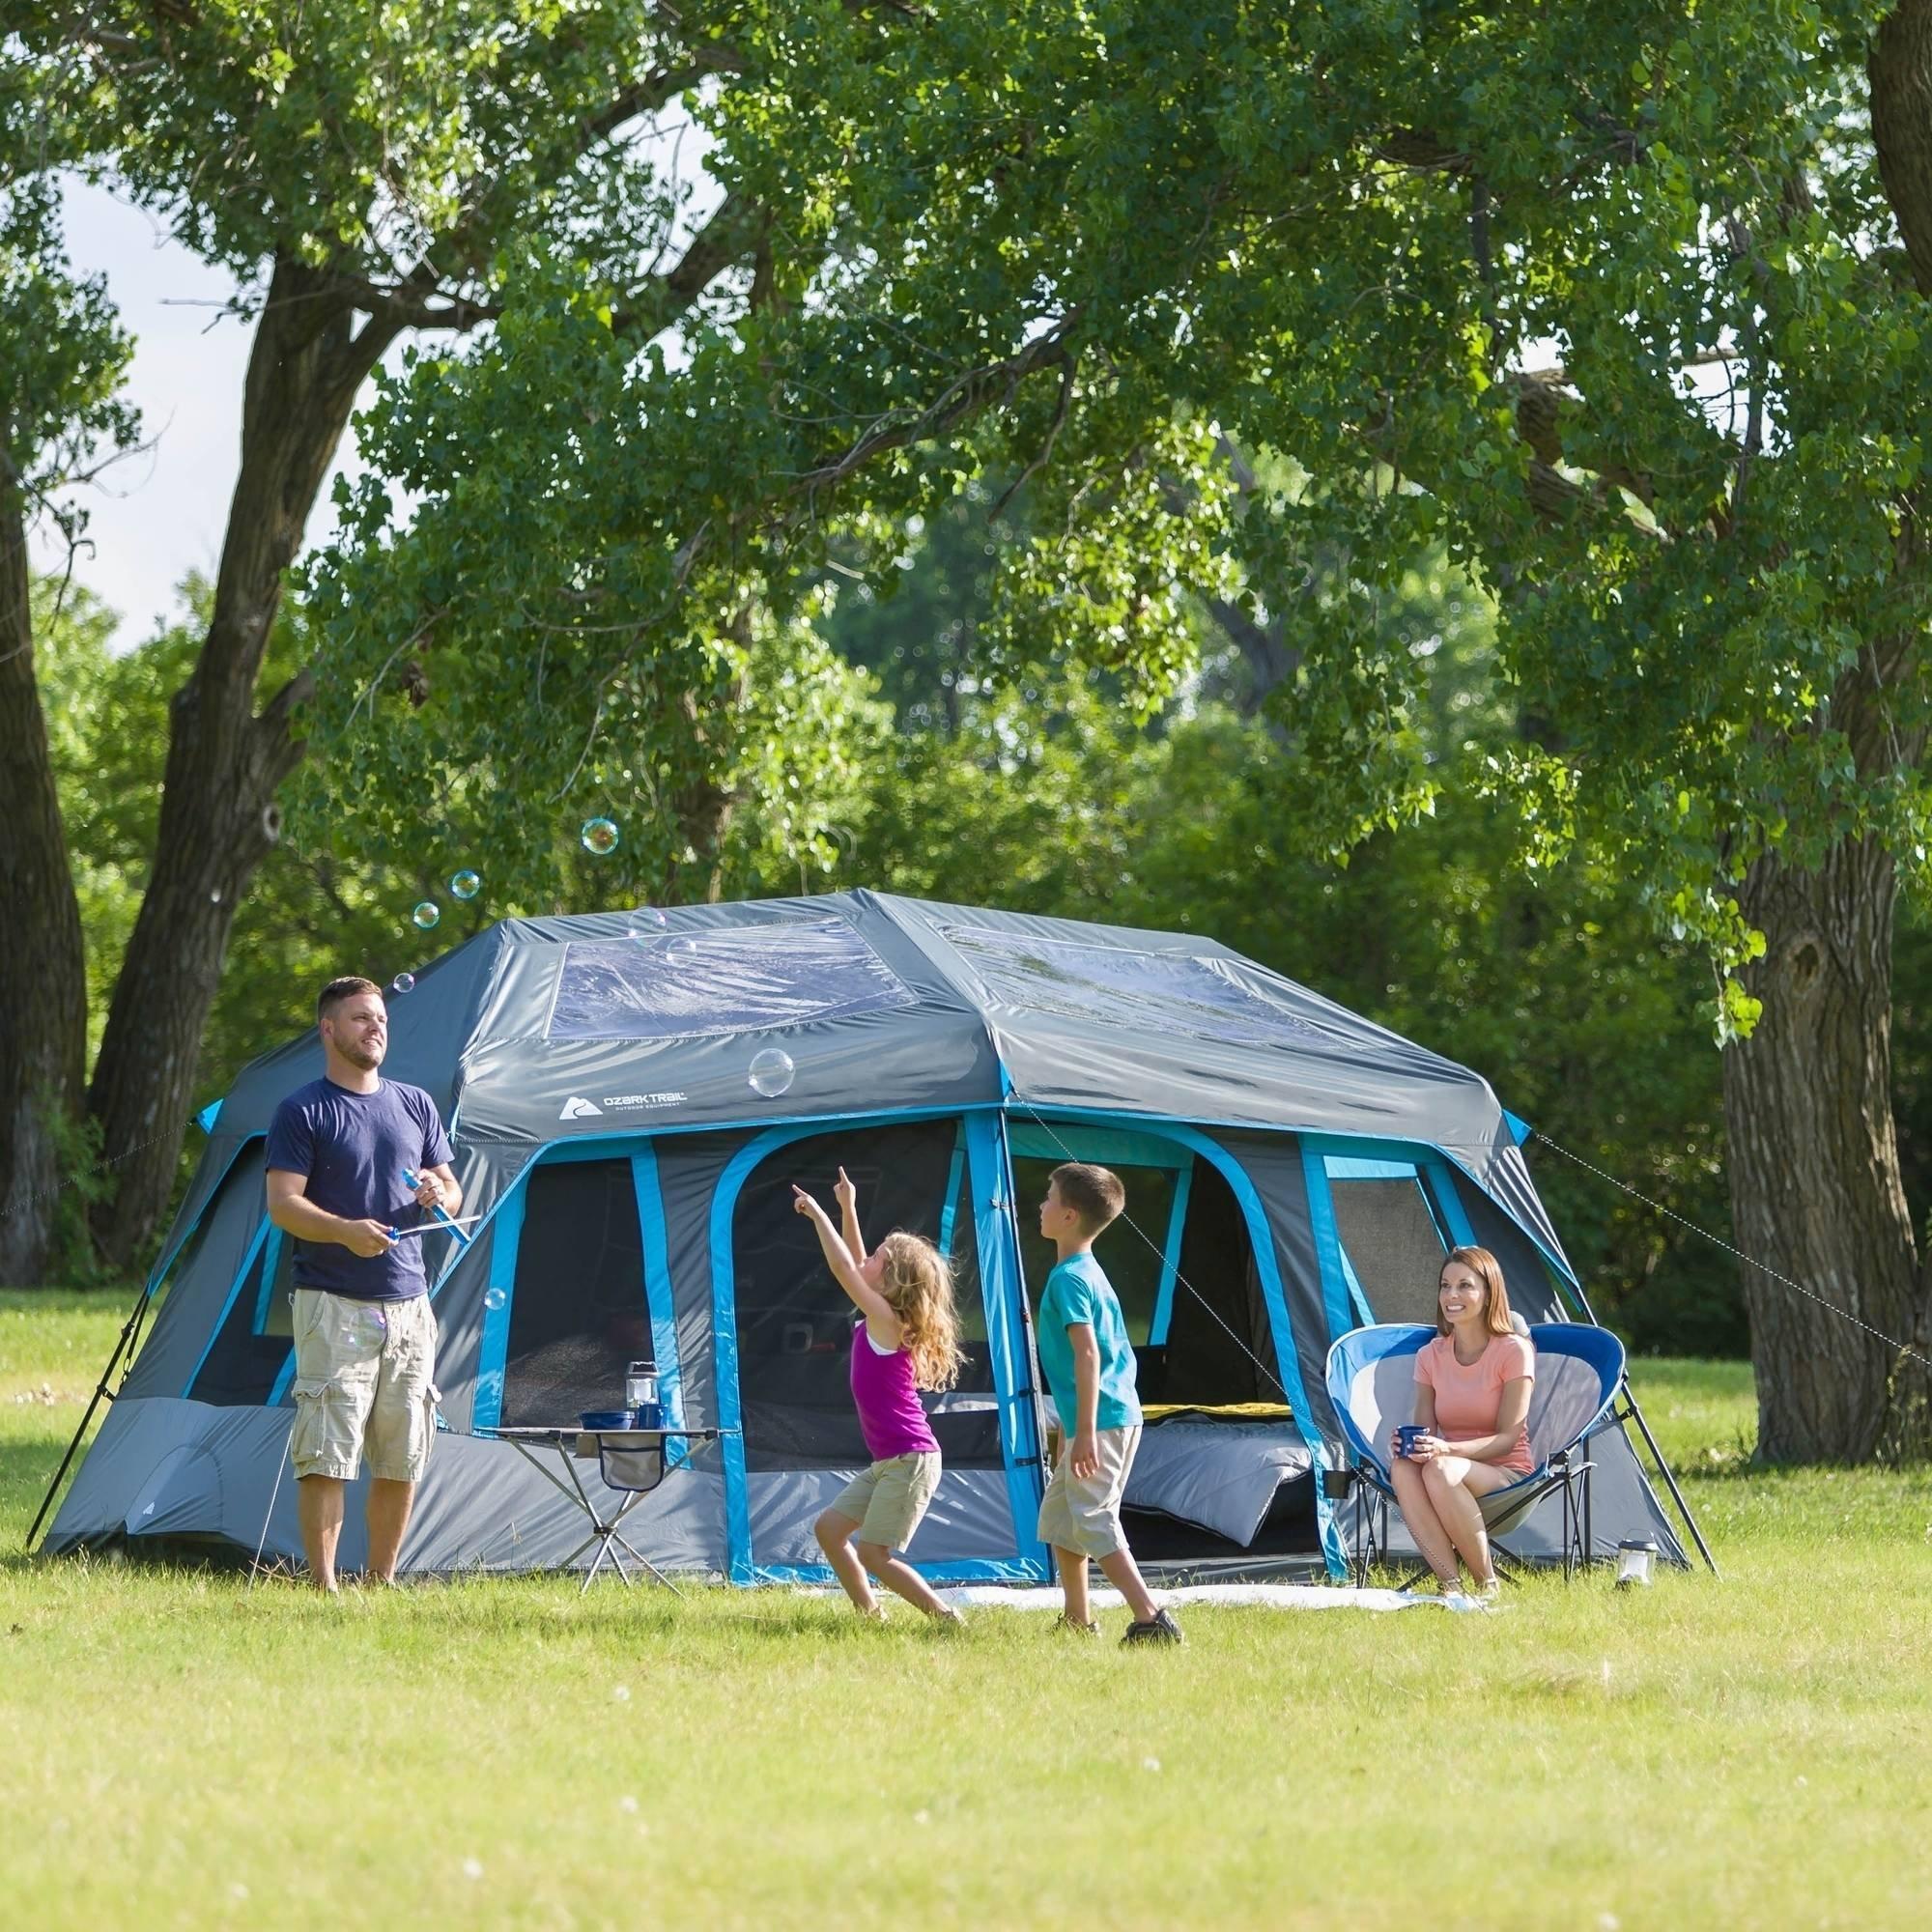 Ozark Trail 10-Person Dark Rest Instant Cabin Tent by Ozark Trail (Image #1)